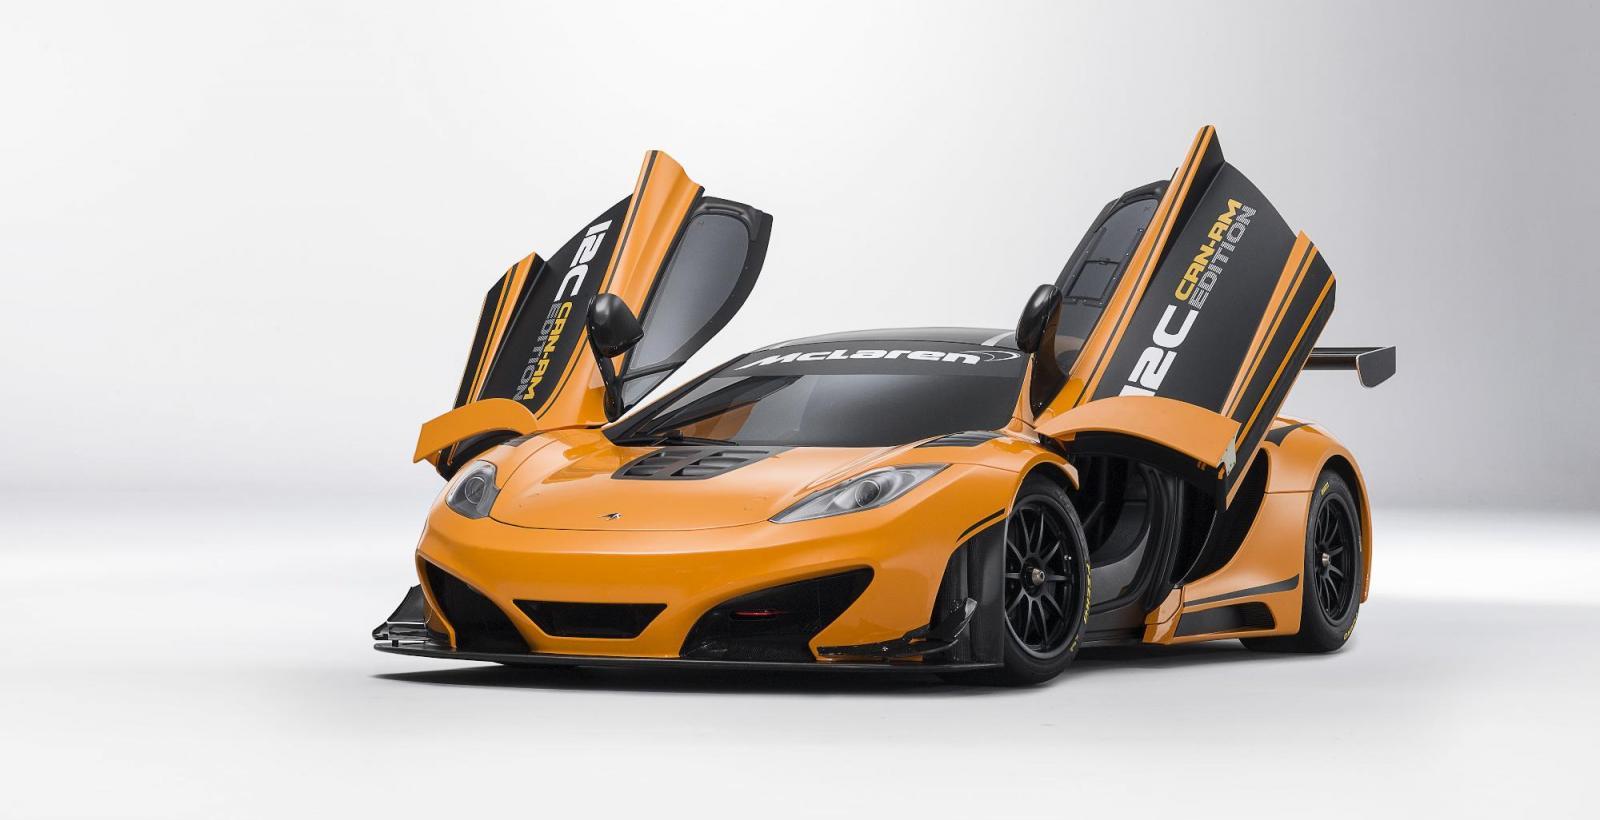 http://images.caradisiac.com/images/0/3/5/5/80355/S0-McLaren-MP4-12C-Cam-Am-Edition-Racing-Concept-268718.jpg